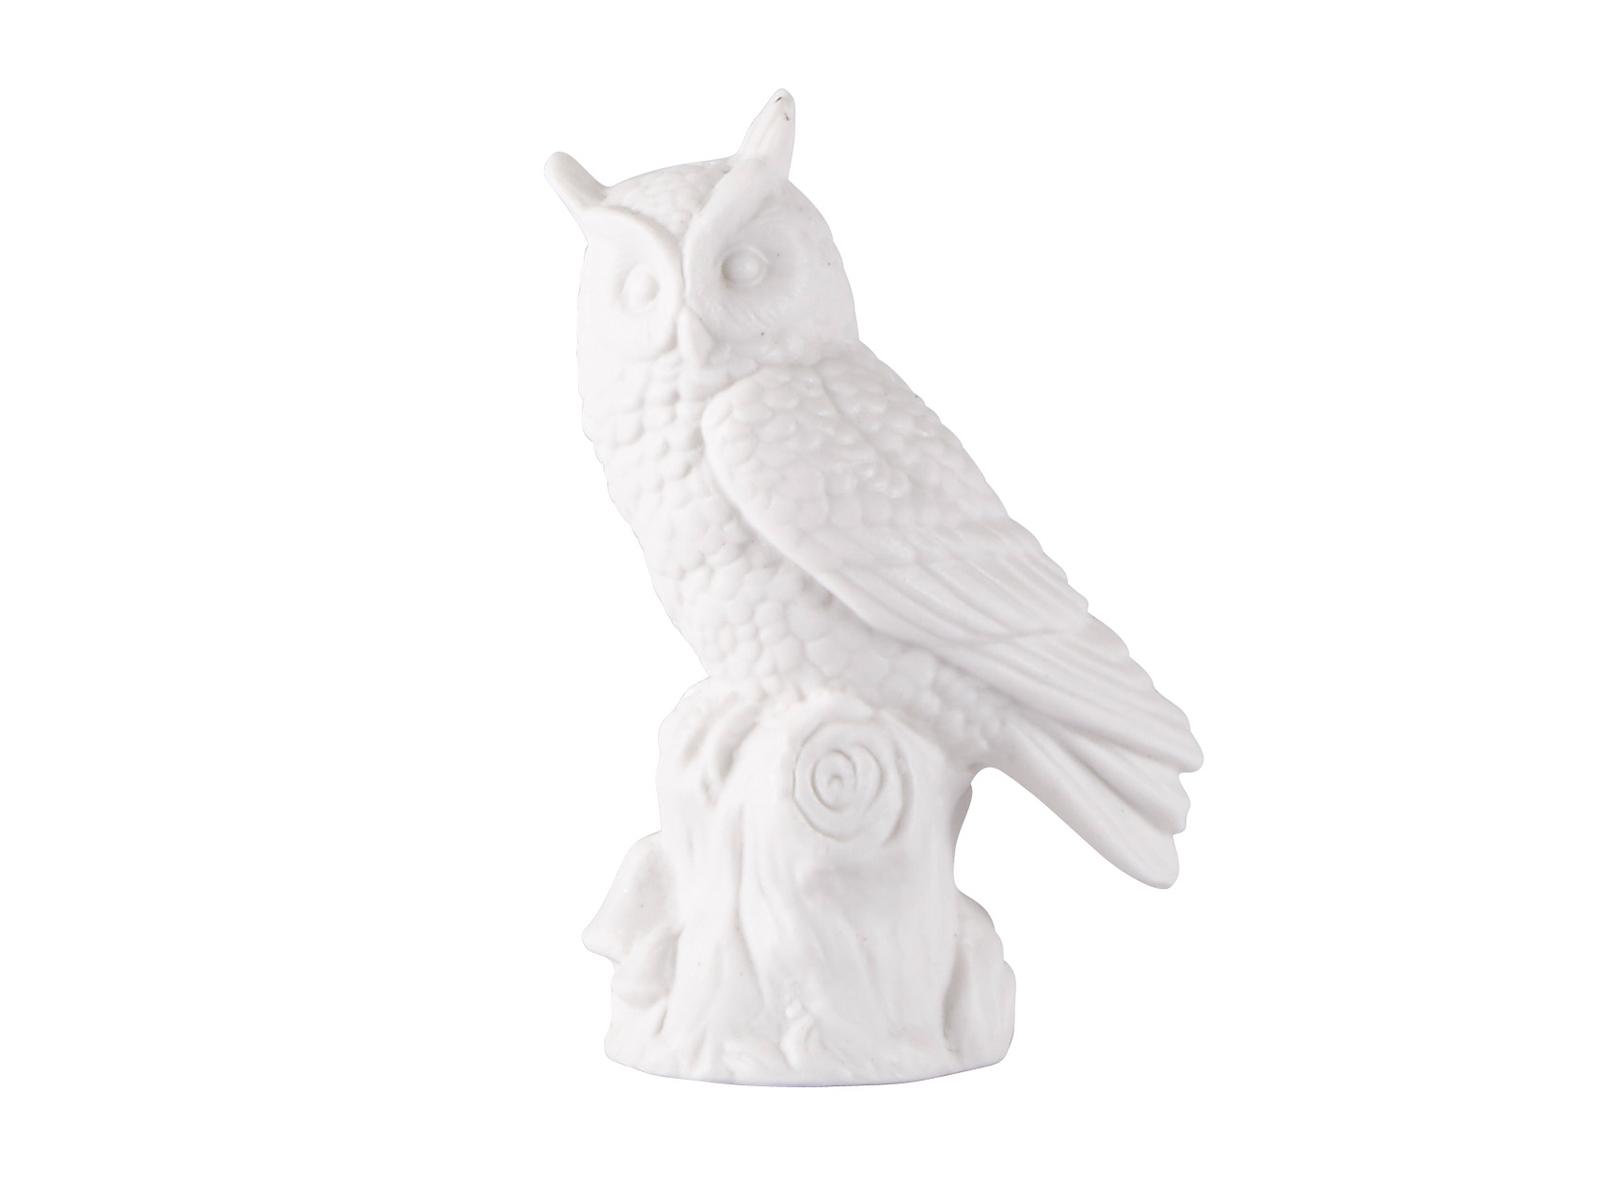 Статуэтка  White OwlСтатуэтки<br><br>